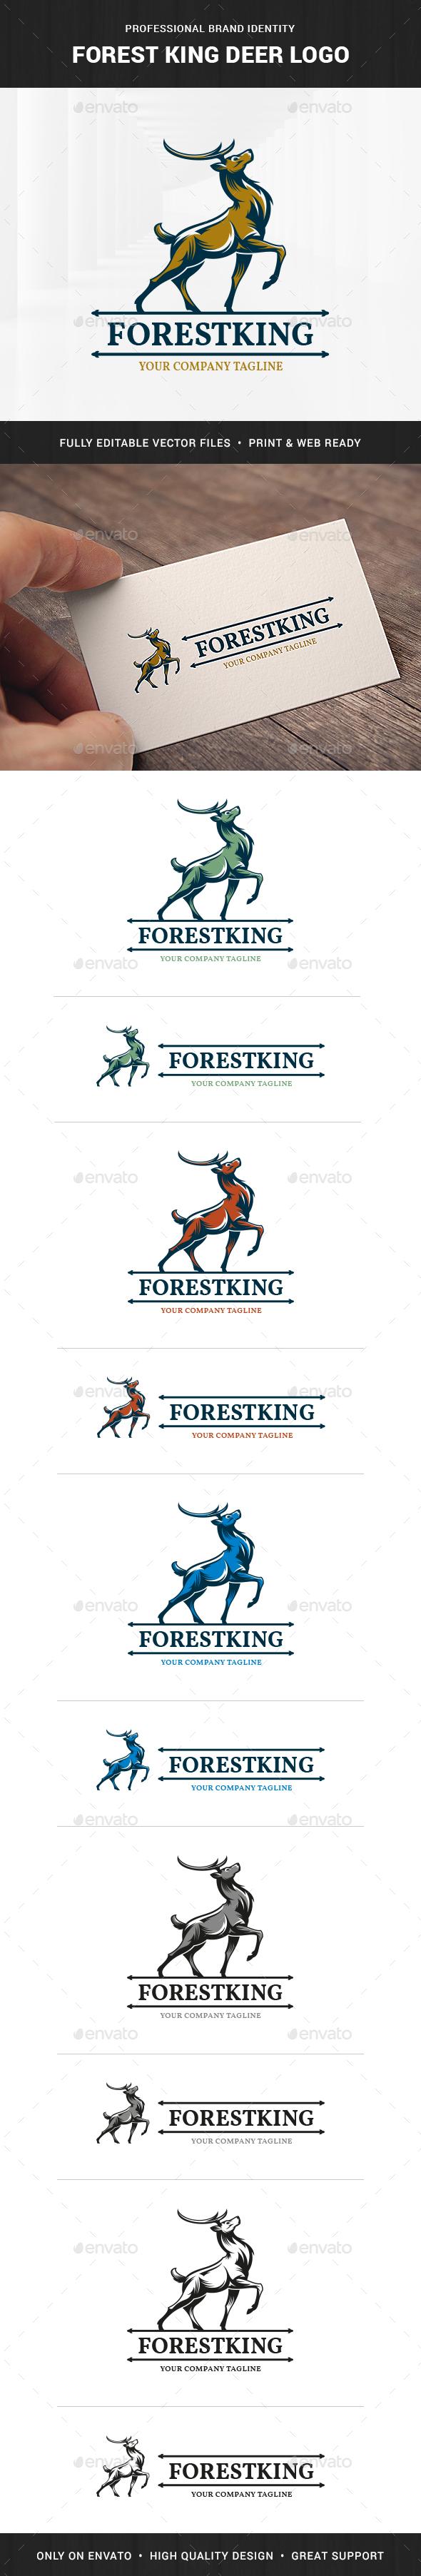 Forest King Deer Logo Template